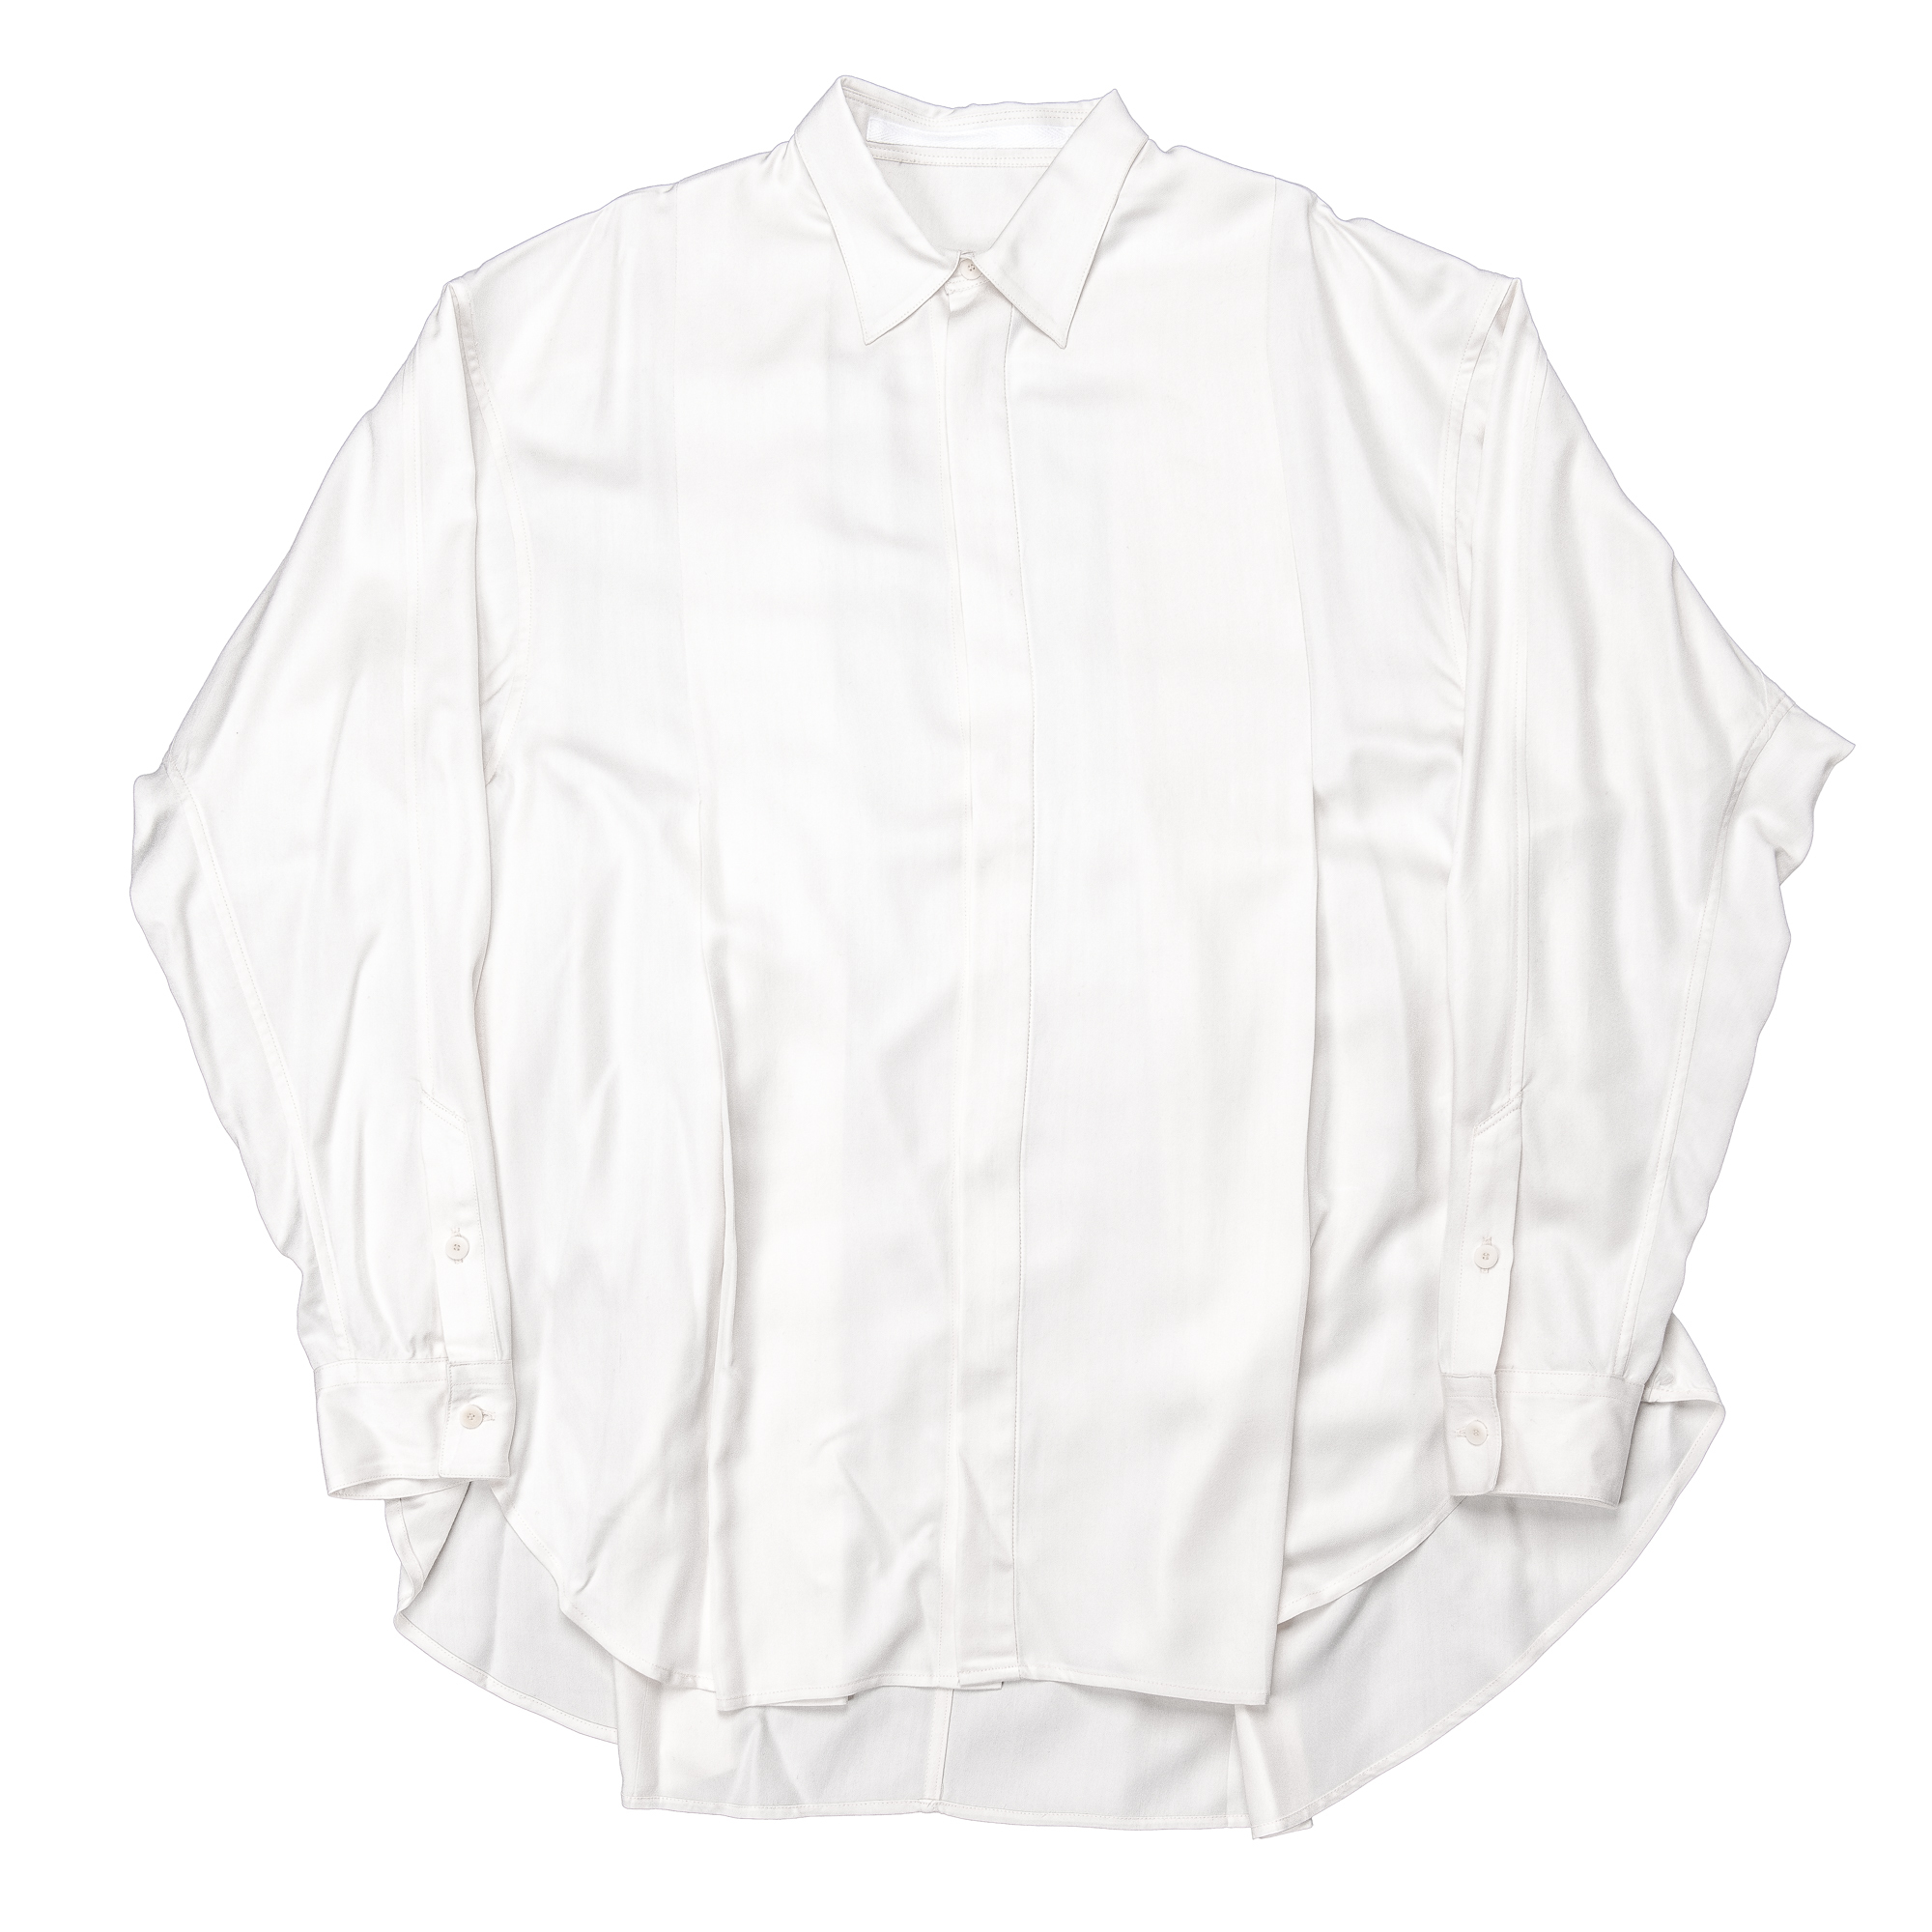 647SHM2-PLASTER / タックドワイドシャツ